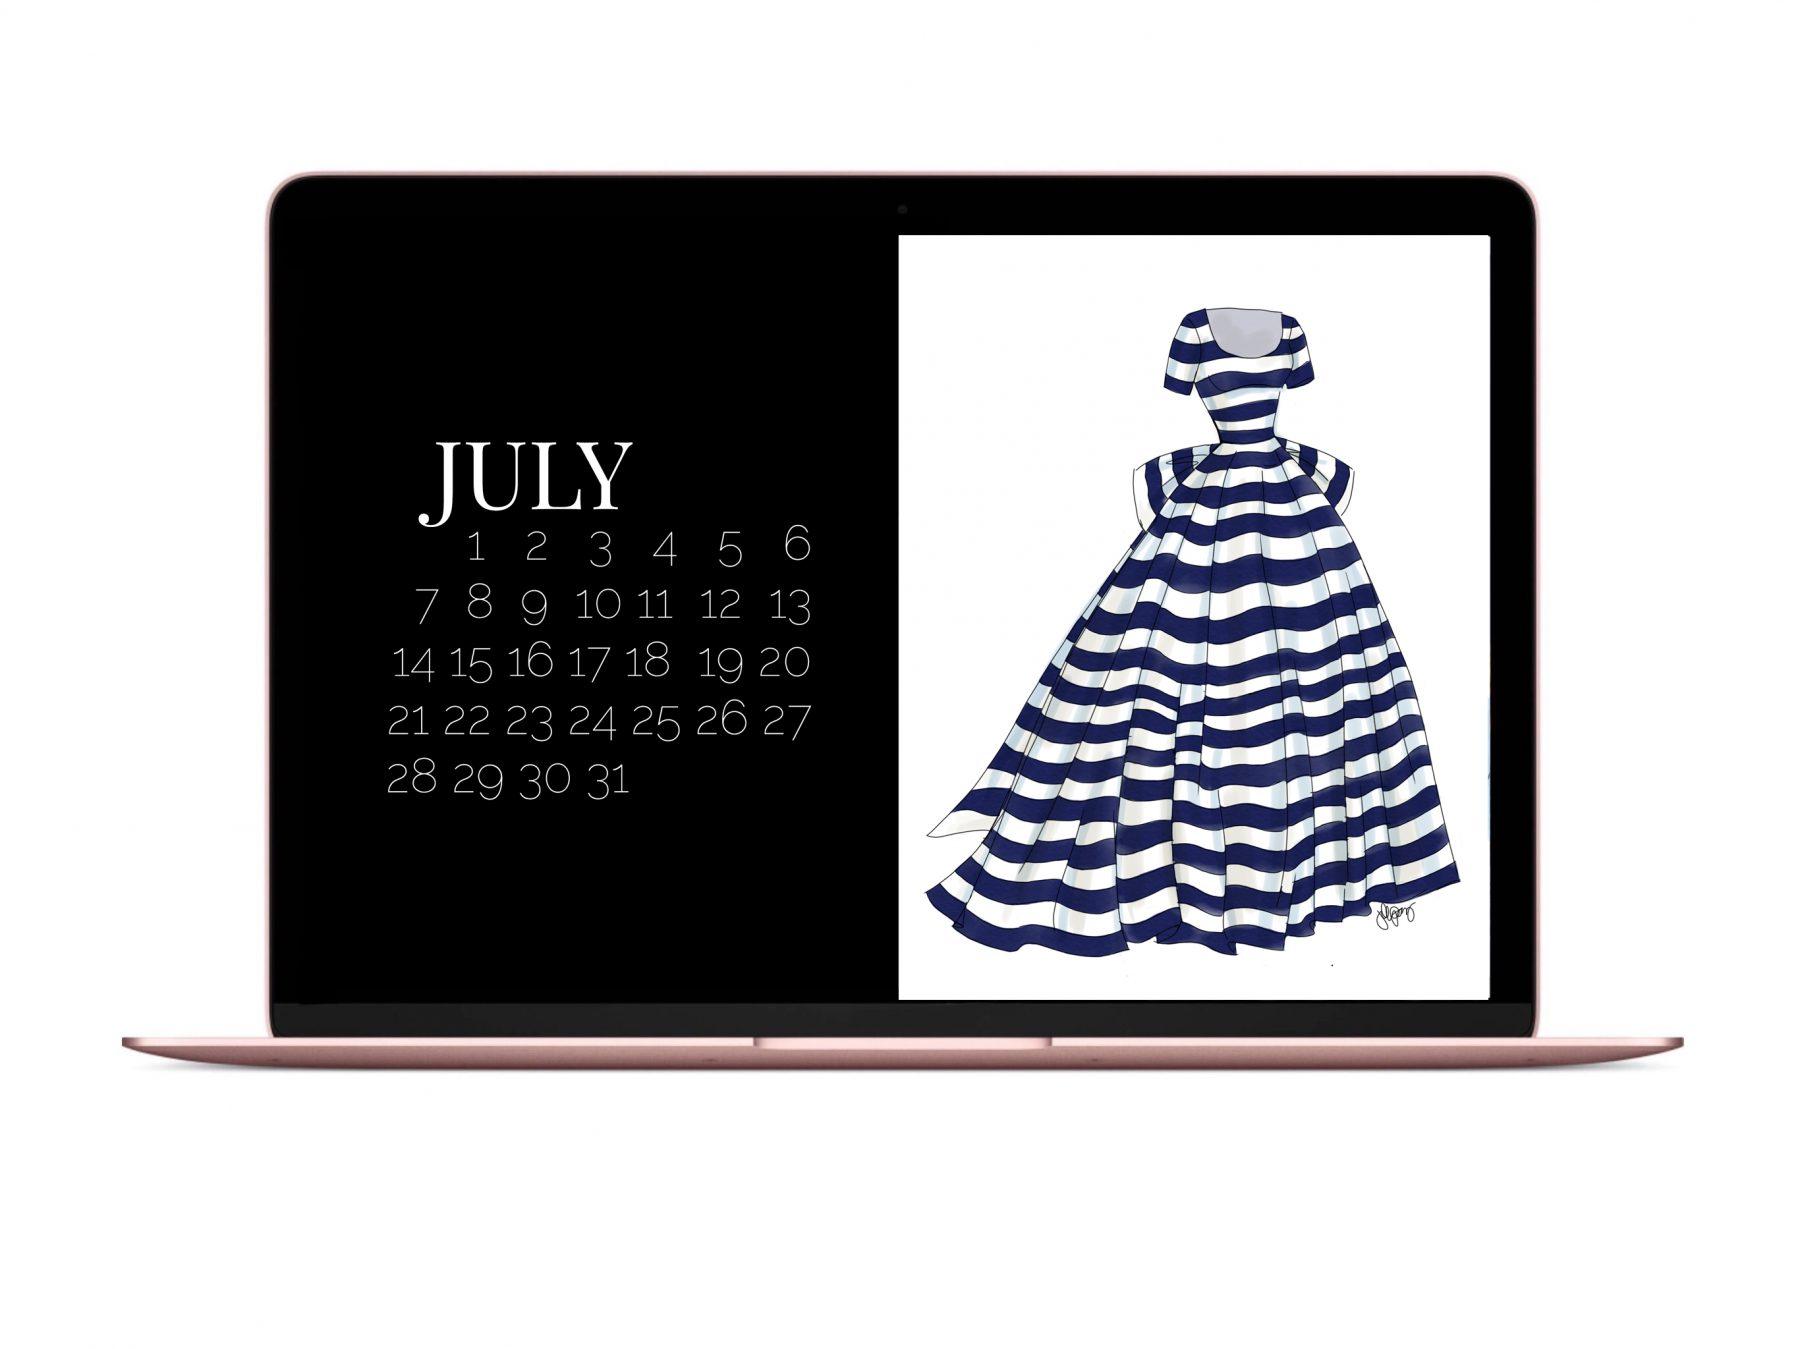 THE JULY DRESS DIGITAL DOWNLOAD